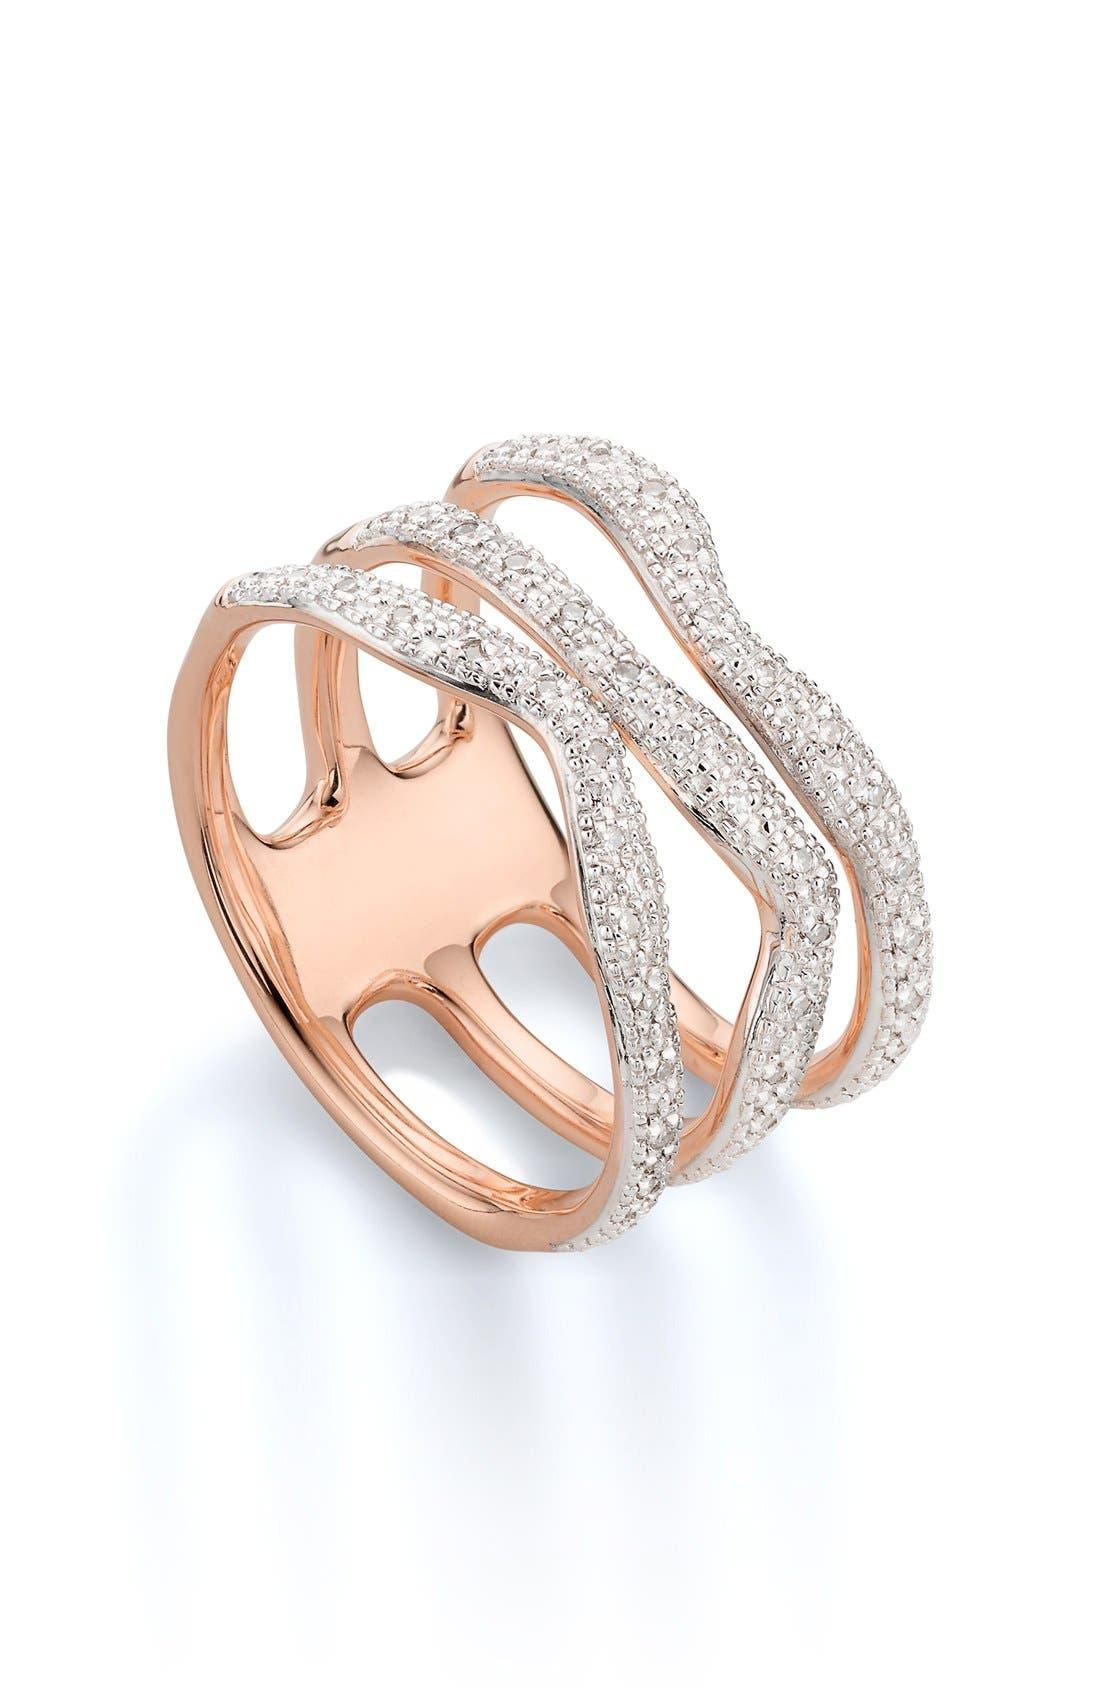 'Riva' Three Band Diamond Ring,                         Main,                         color, ROSE GOLD